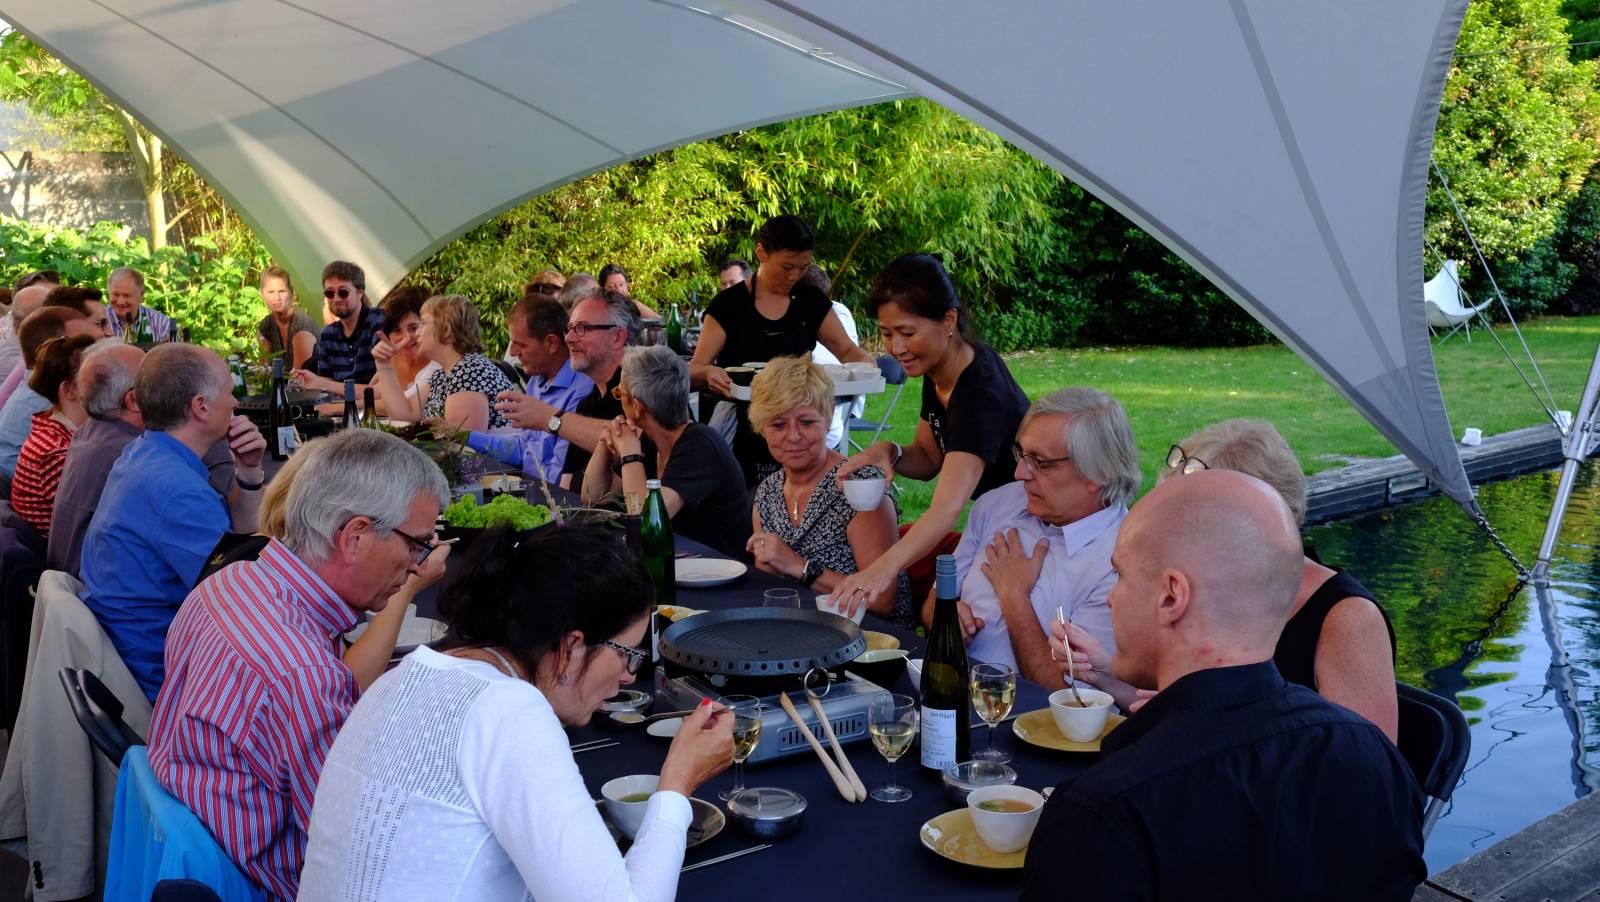 Table d'Ho - foodtruck - House of Weddings 3 - 1